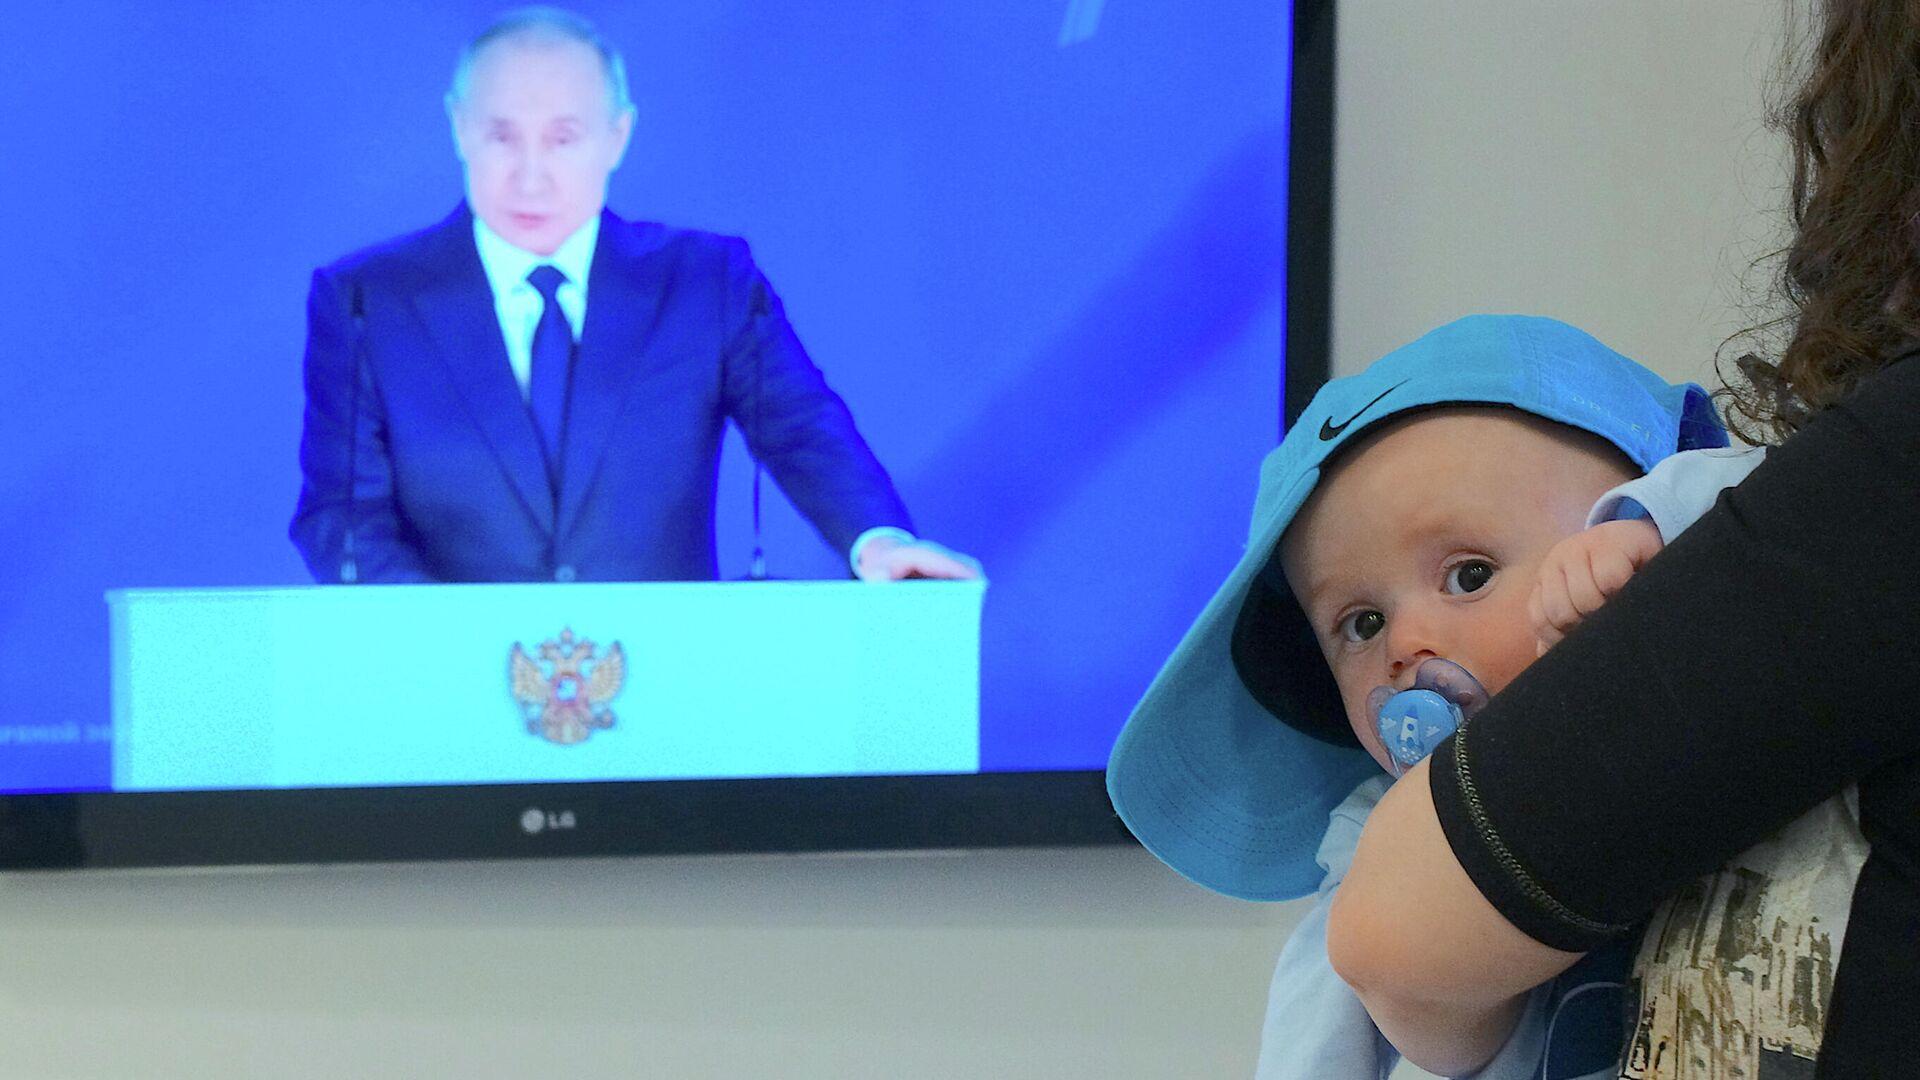 Neonato e Putin - Sputnik Italia, 1920, 11.09.2021